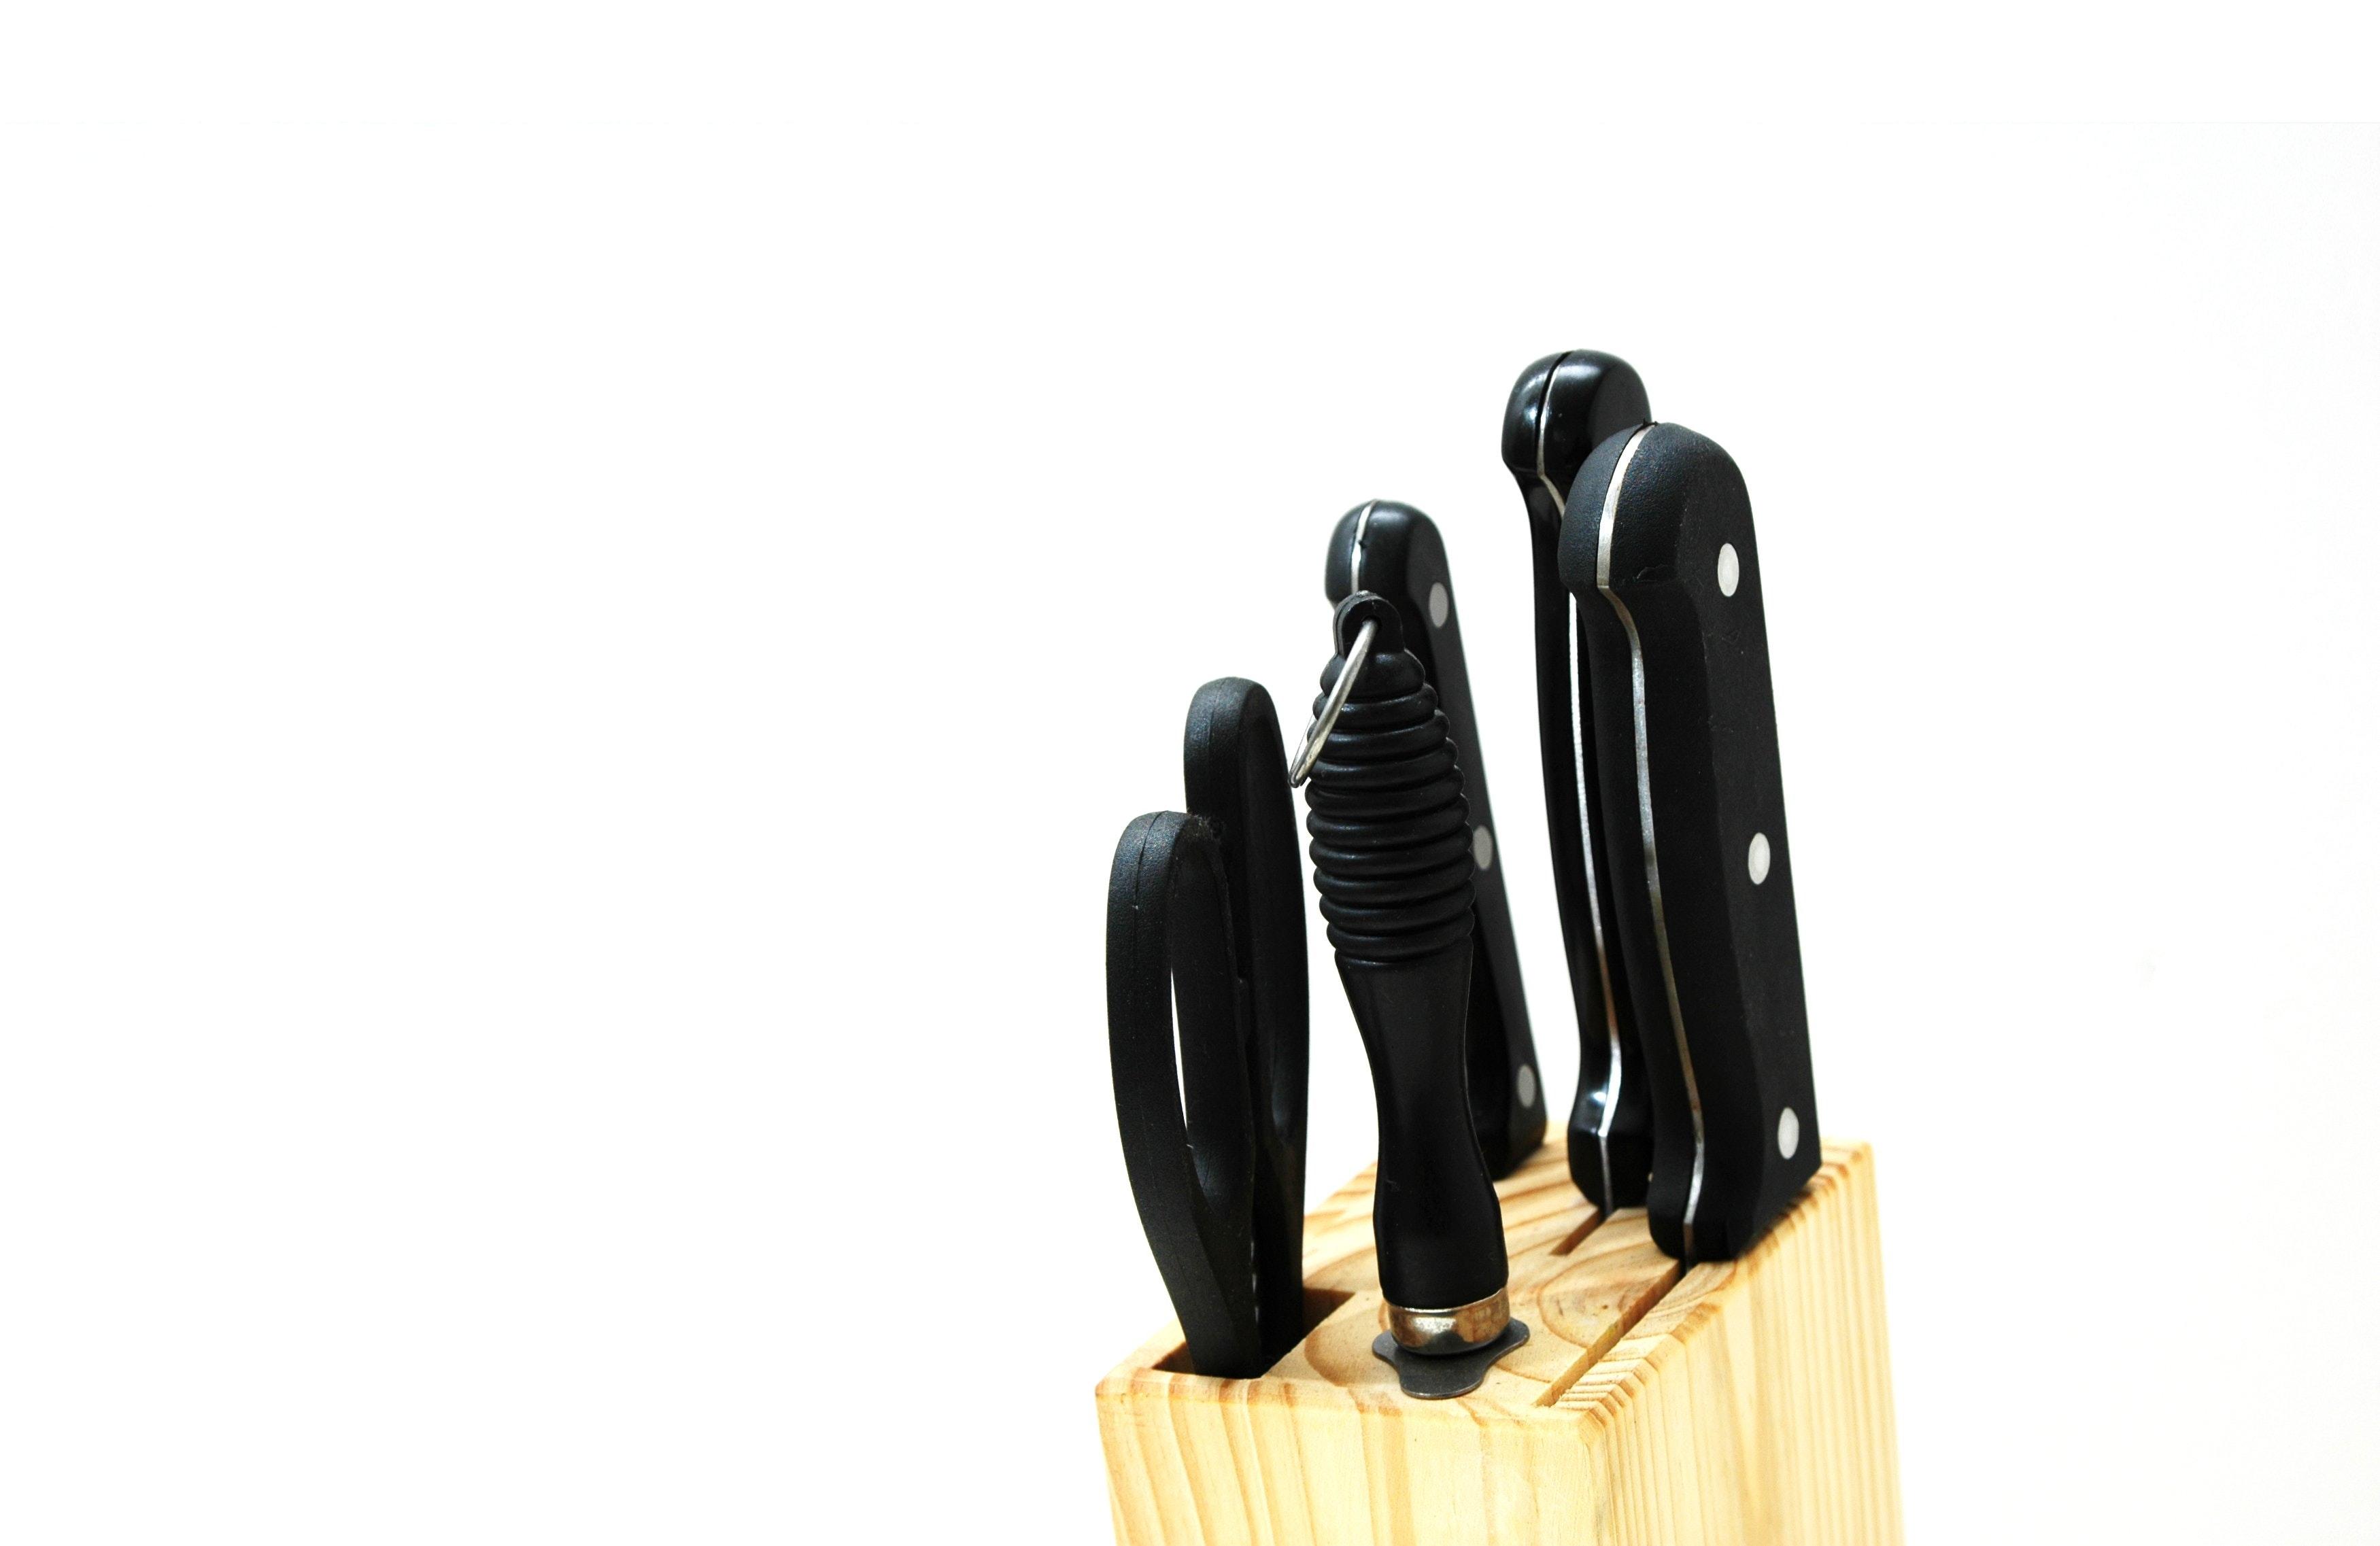 Black handled kitchen knife on beige wooden pallet photo